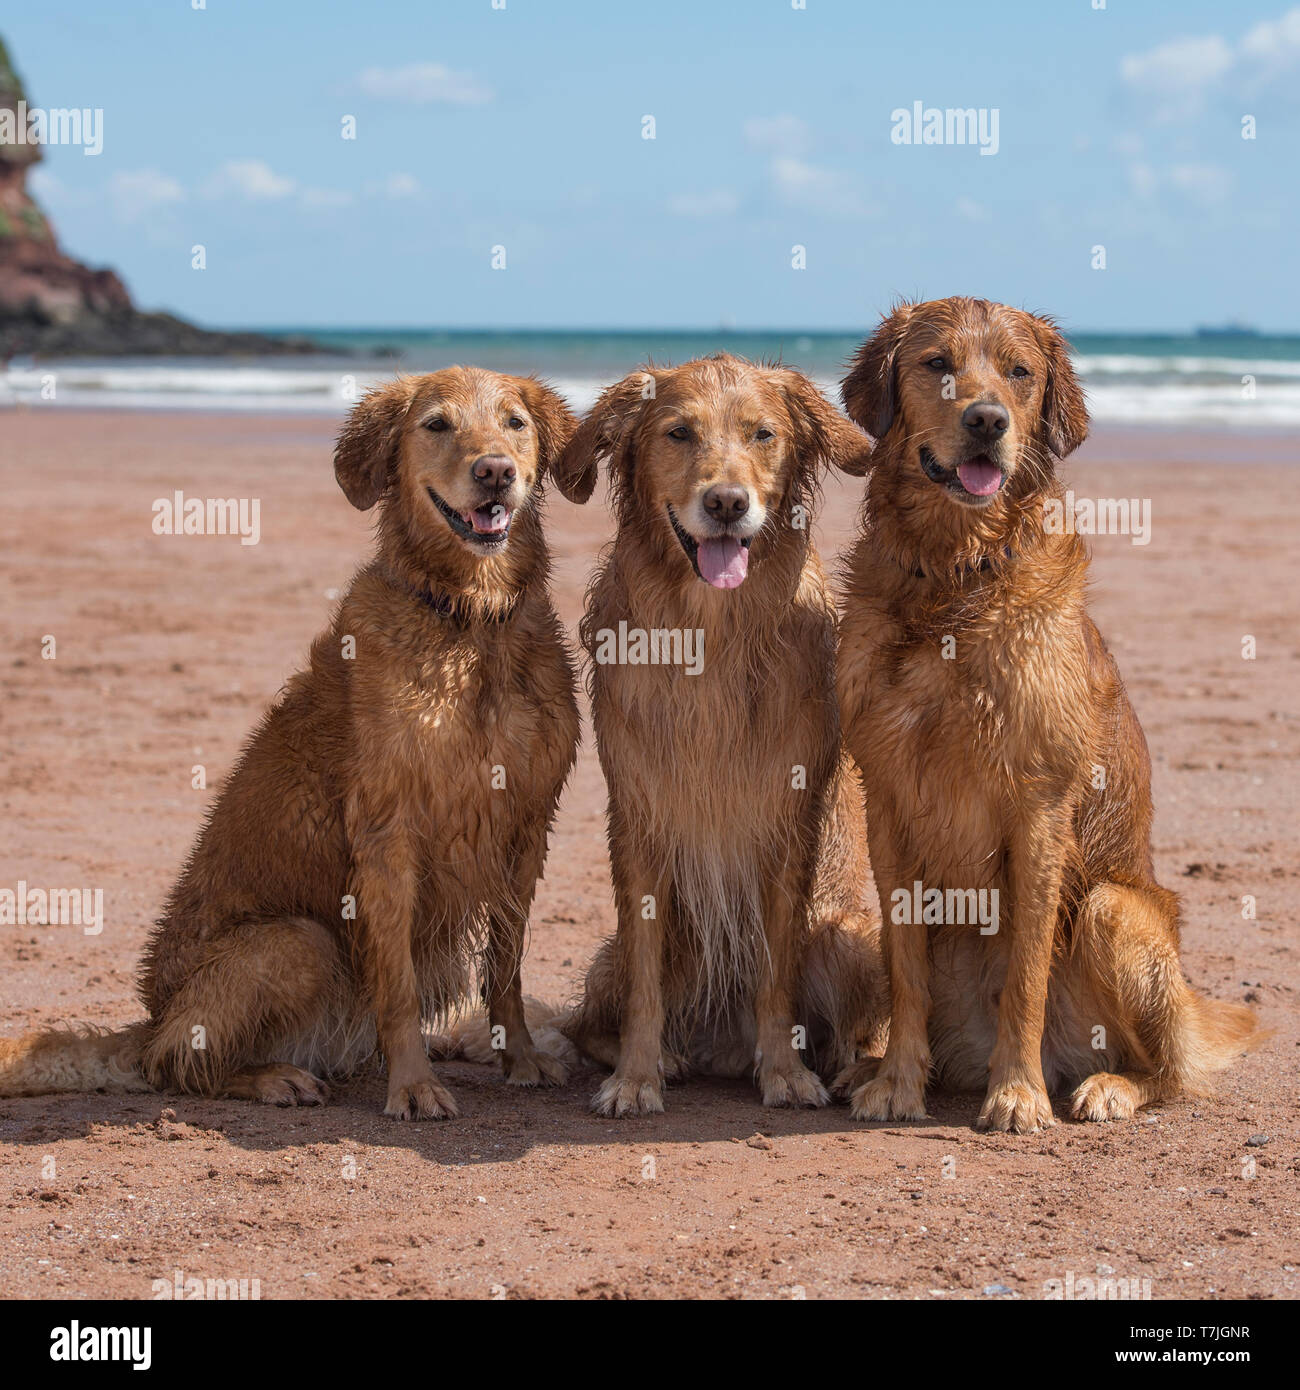 three golden retrievers on the beach - Stock Image